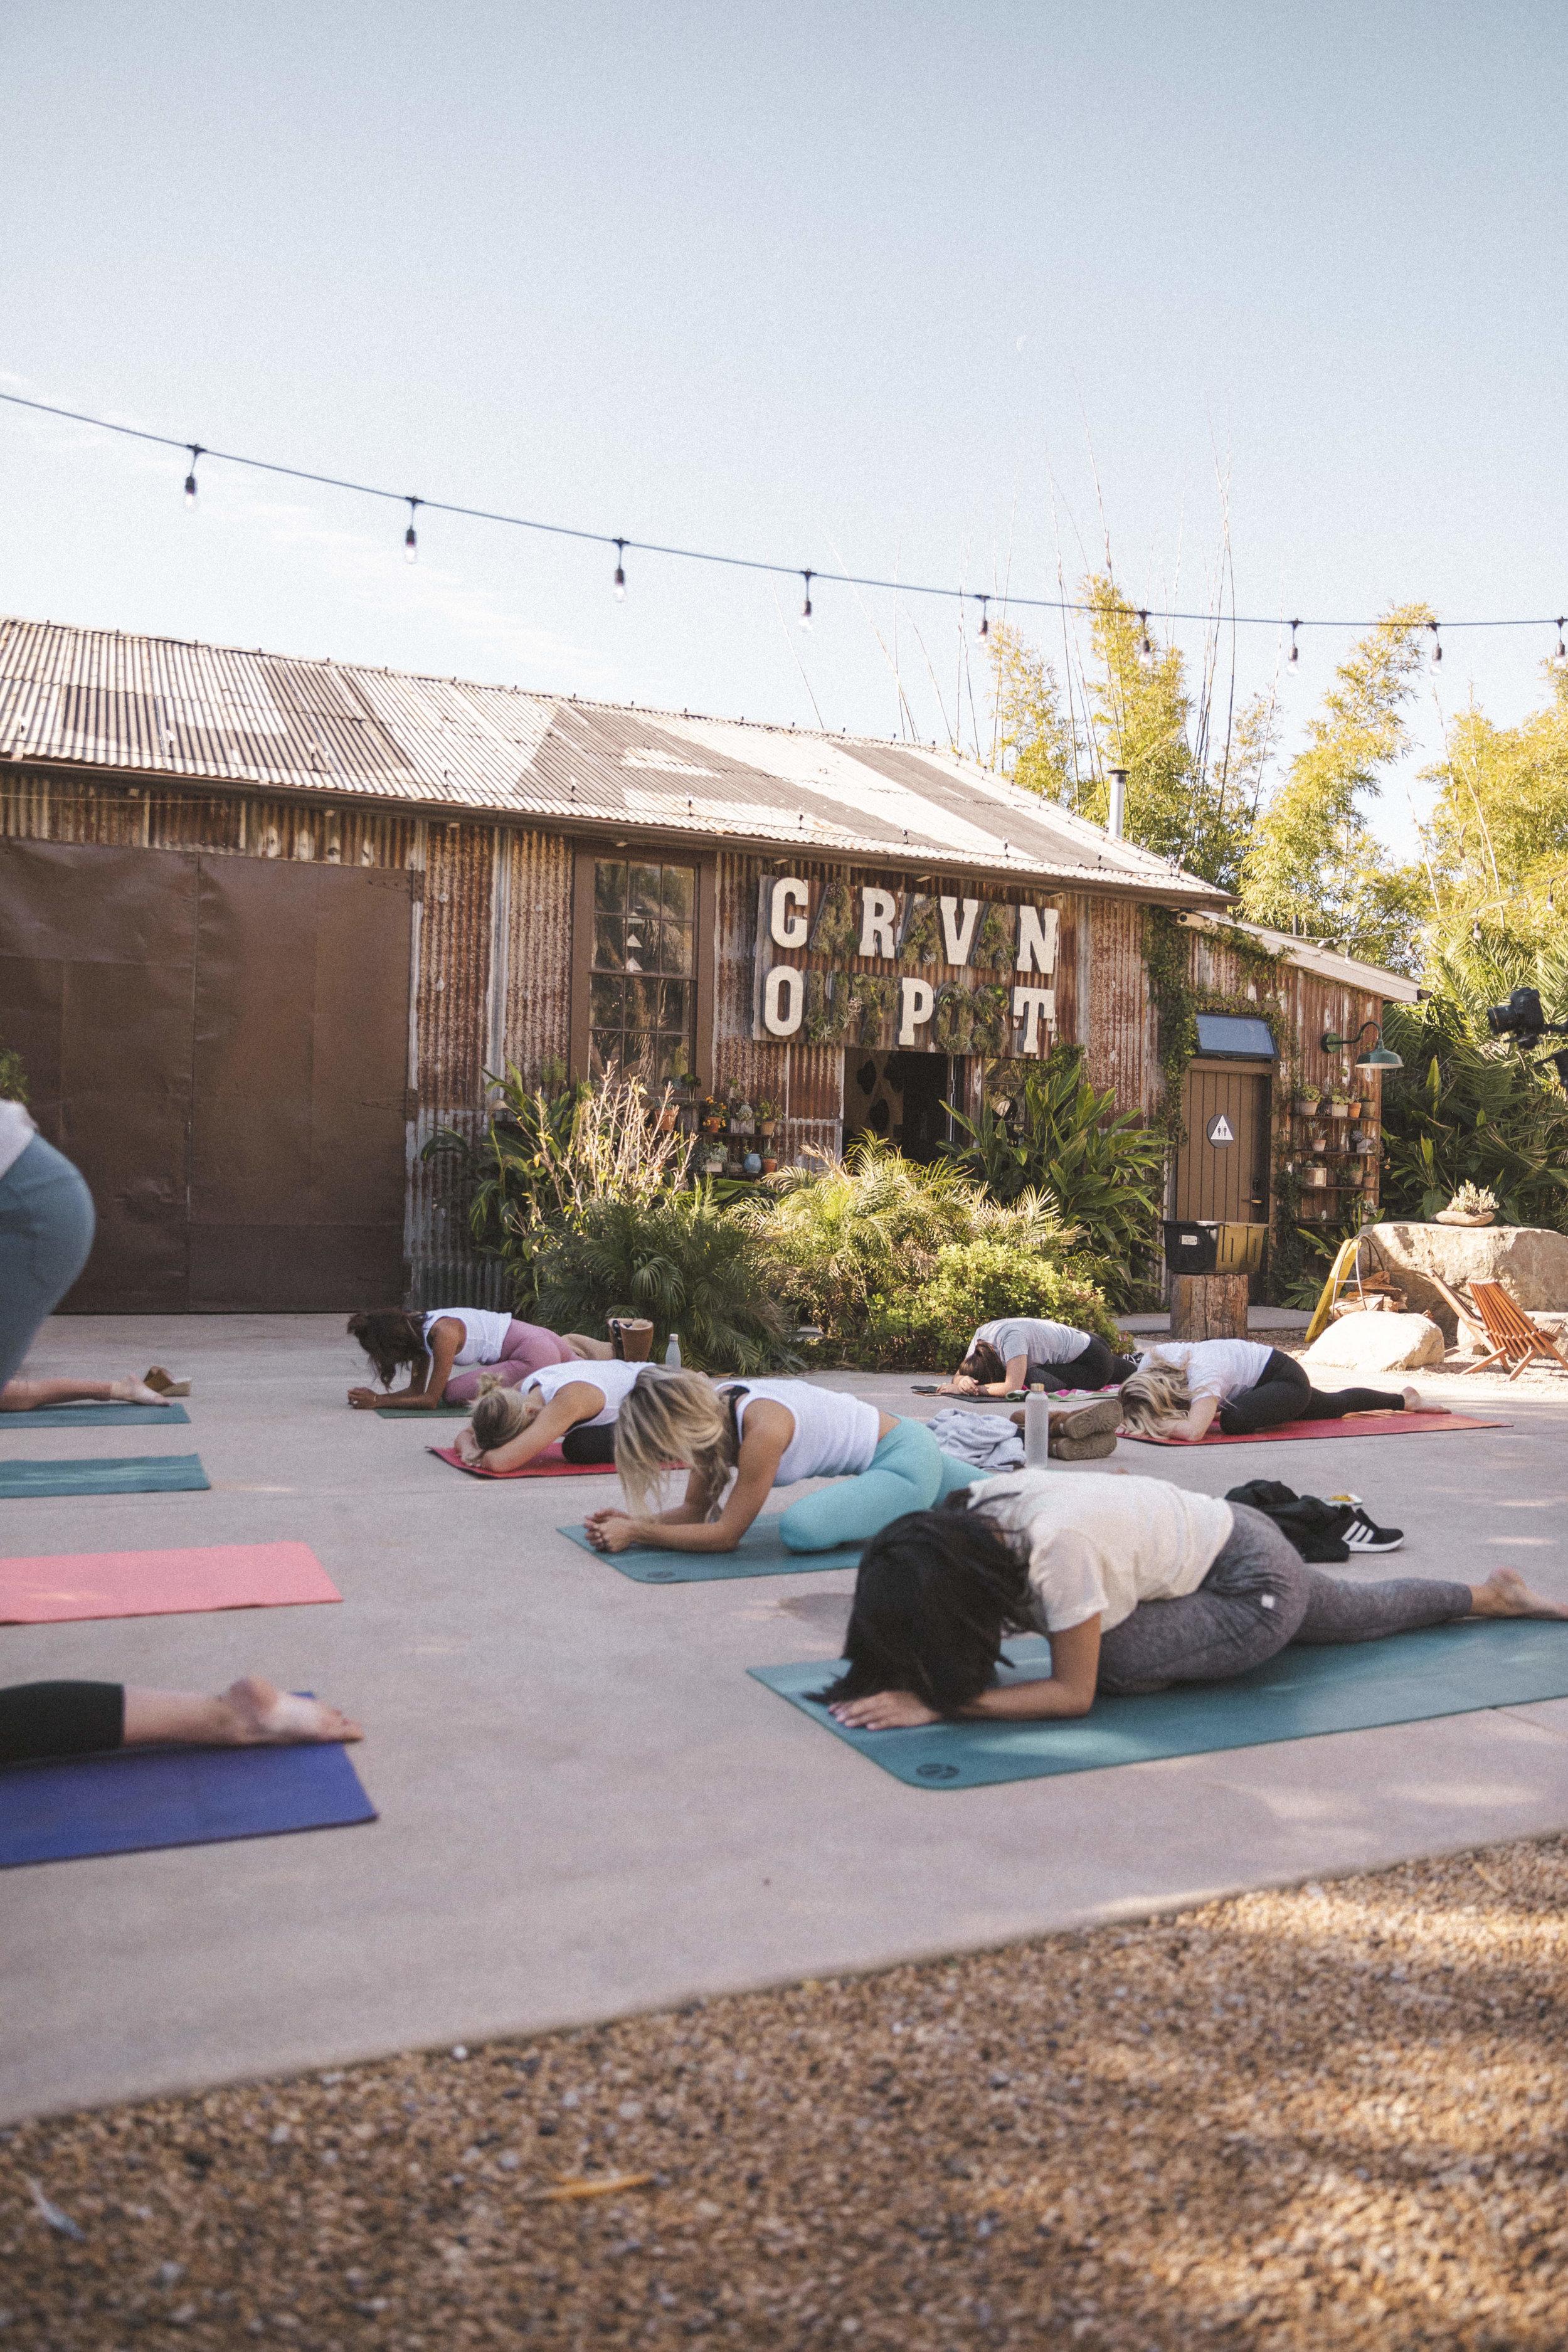 Morning yoga at Caravan Outpost